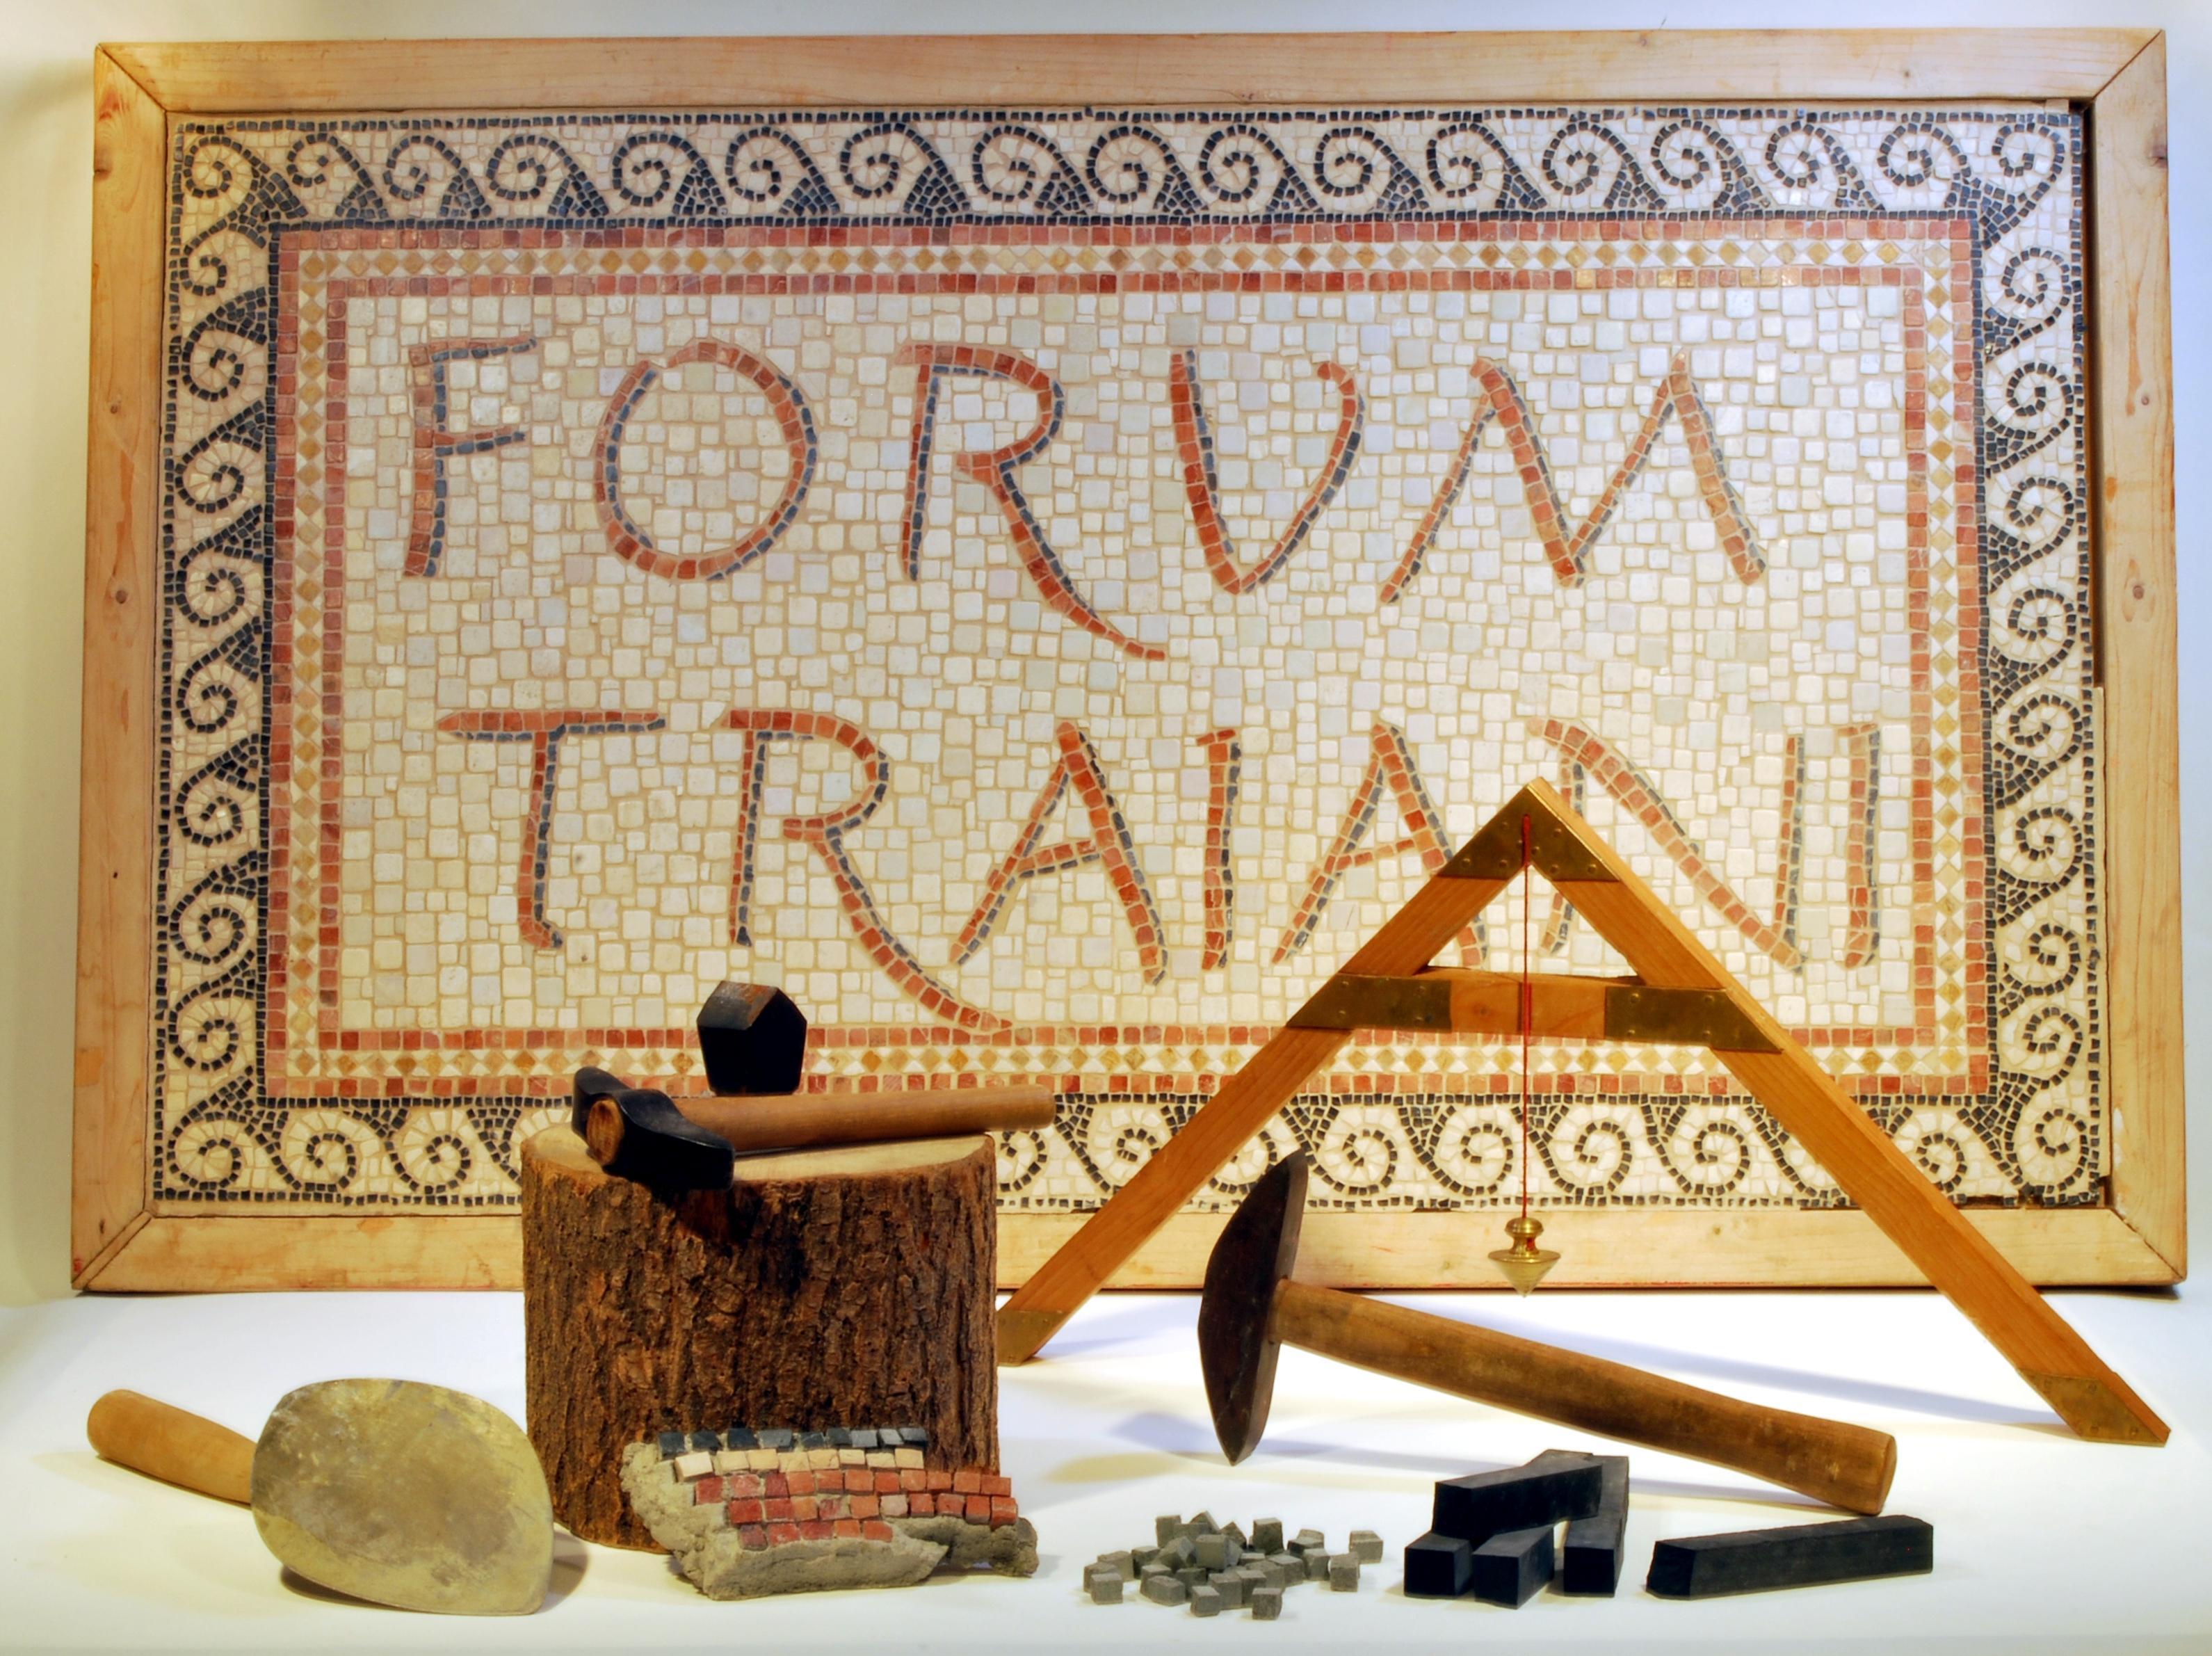 Antikes Mosaikwerkzeug